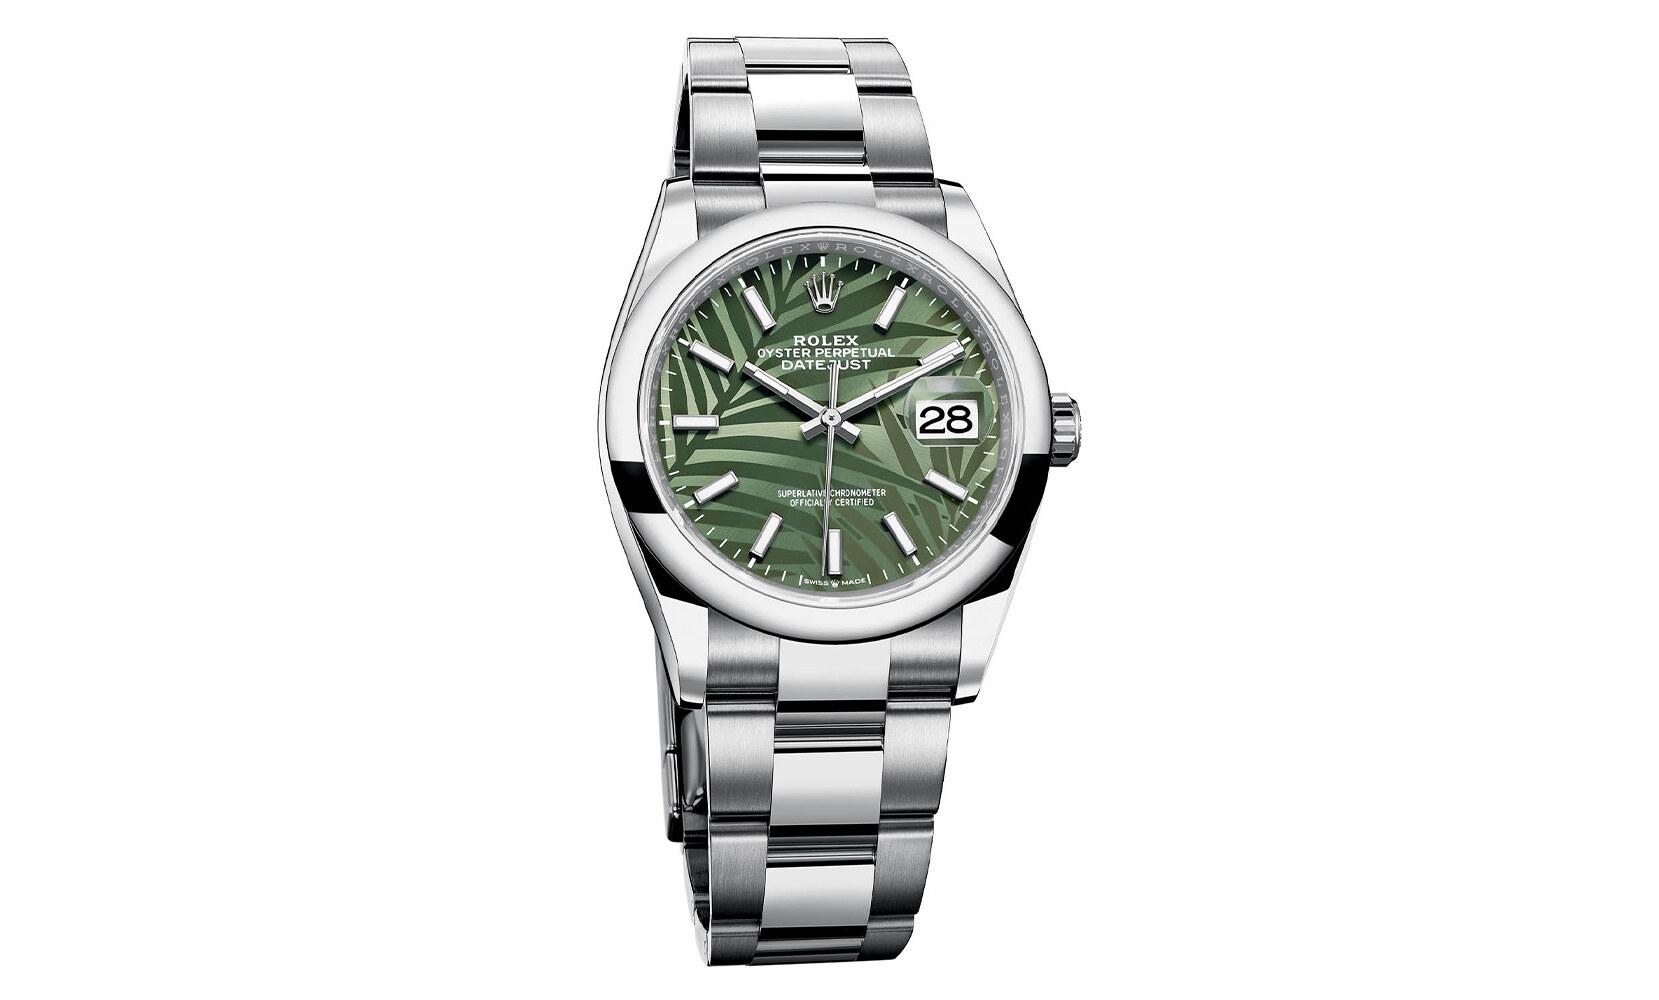 Rolex Datejust Palm Motif